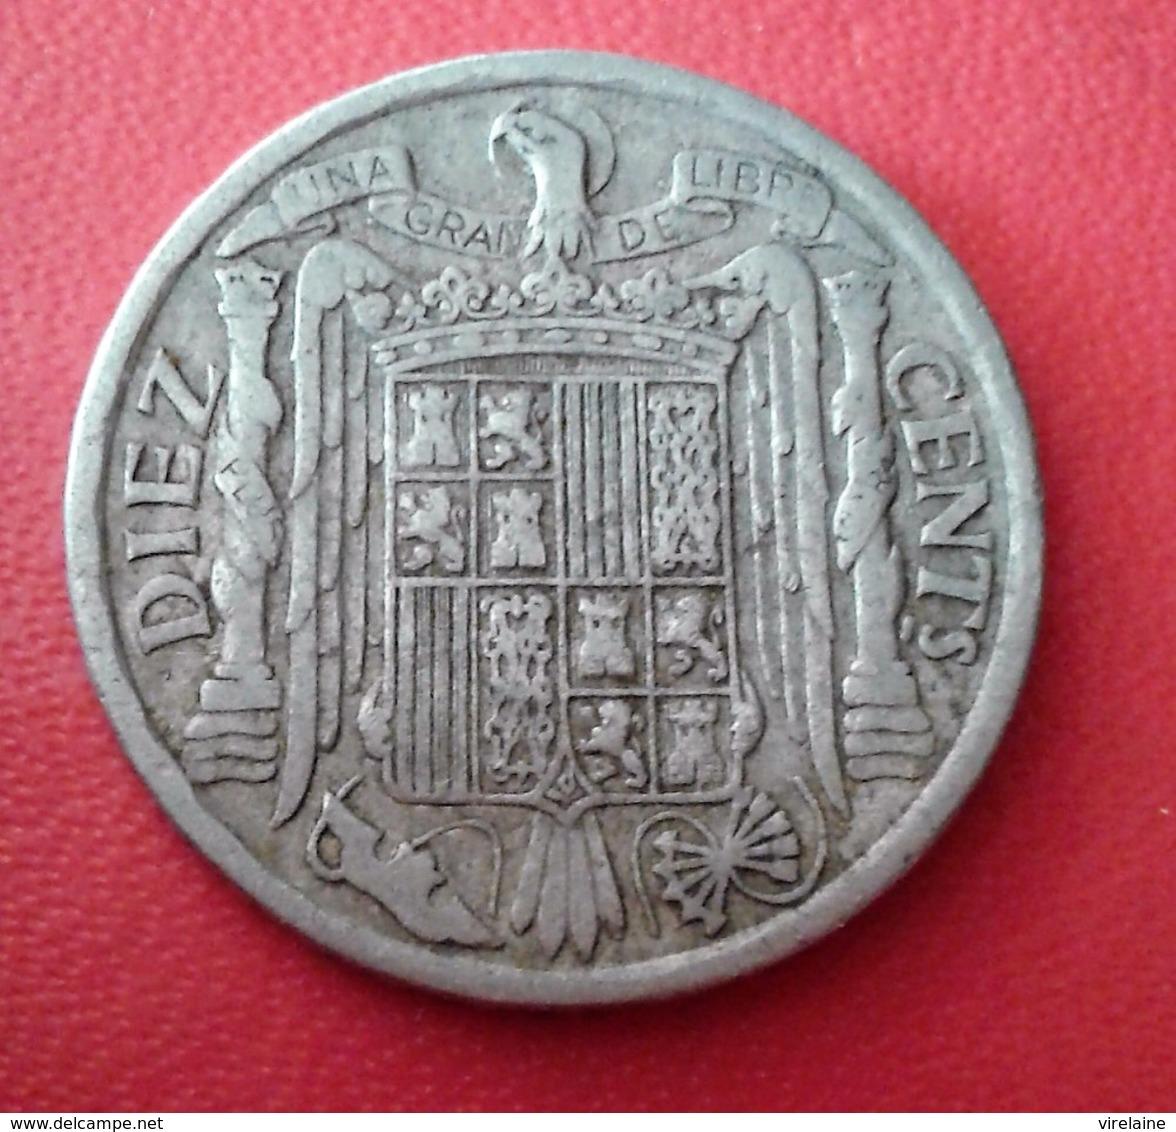 ESPAGNE 10 CENTIMOS 1940 N° 229D - 10 Centimos